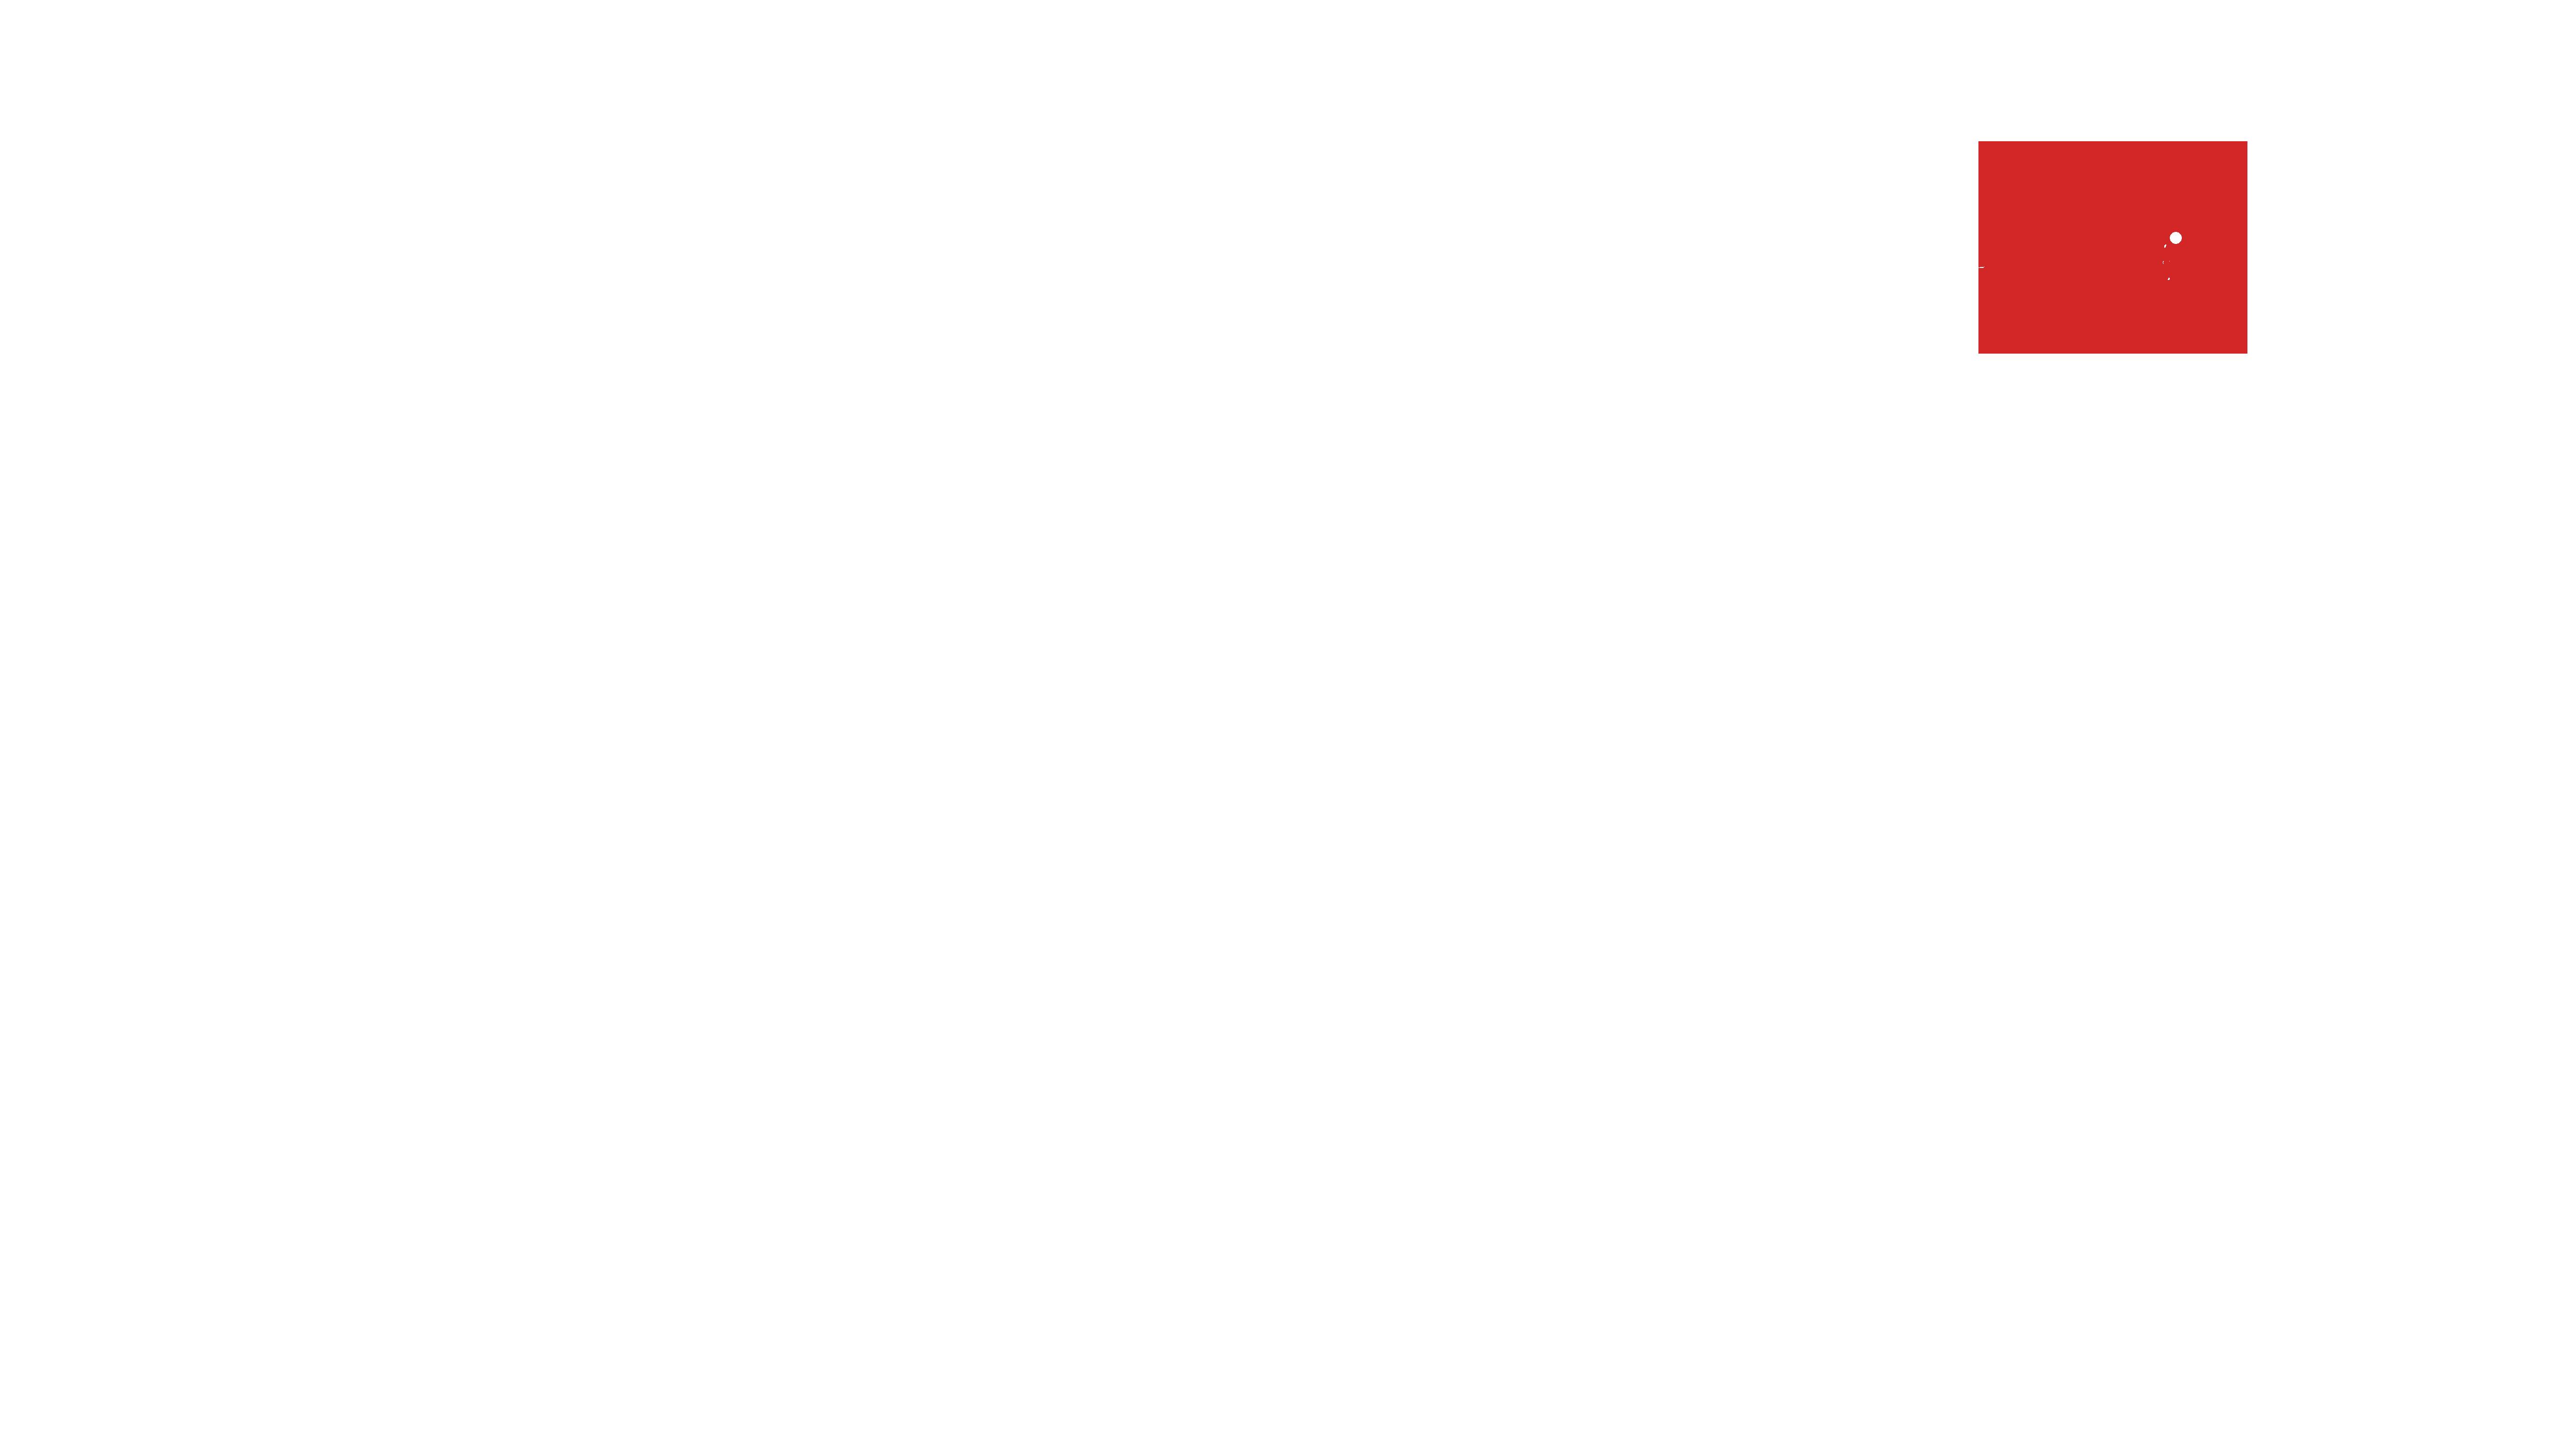 Musou logo